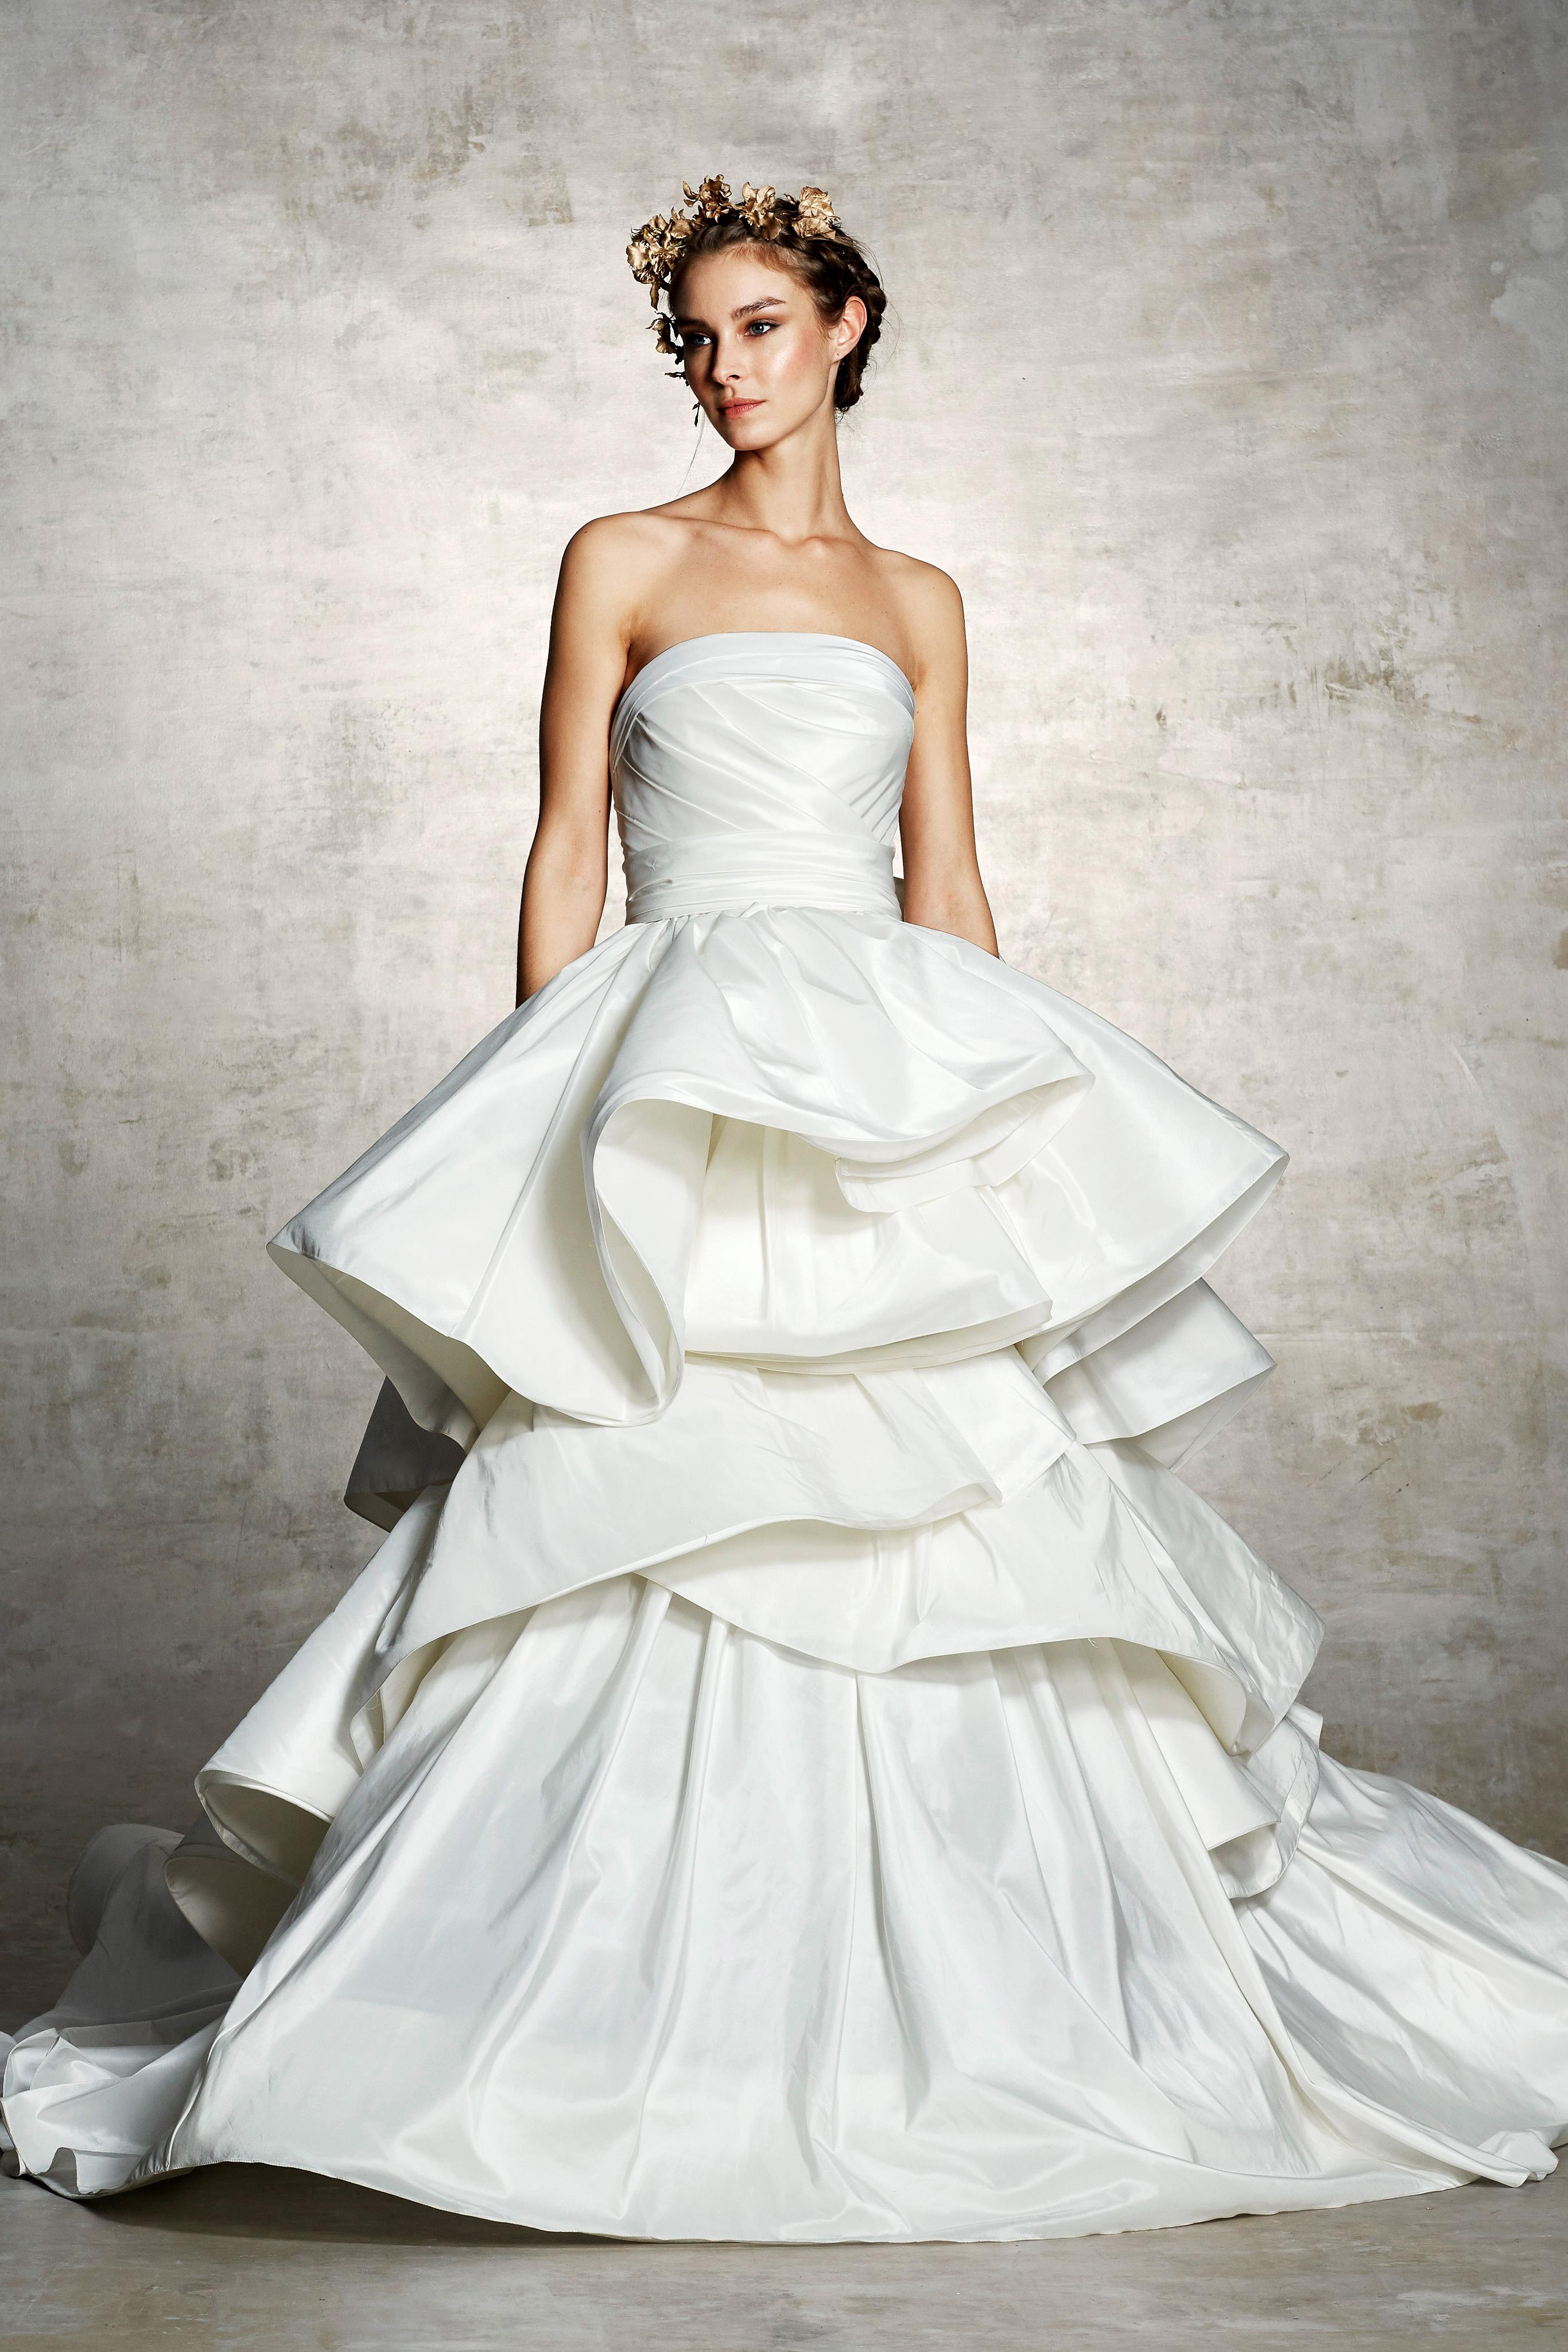 marchesa bridal wedding dress strapless ruffles layers